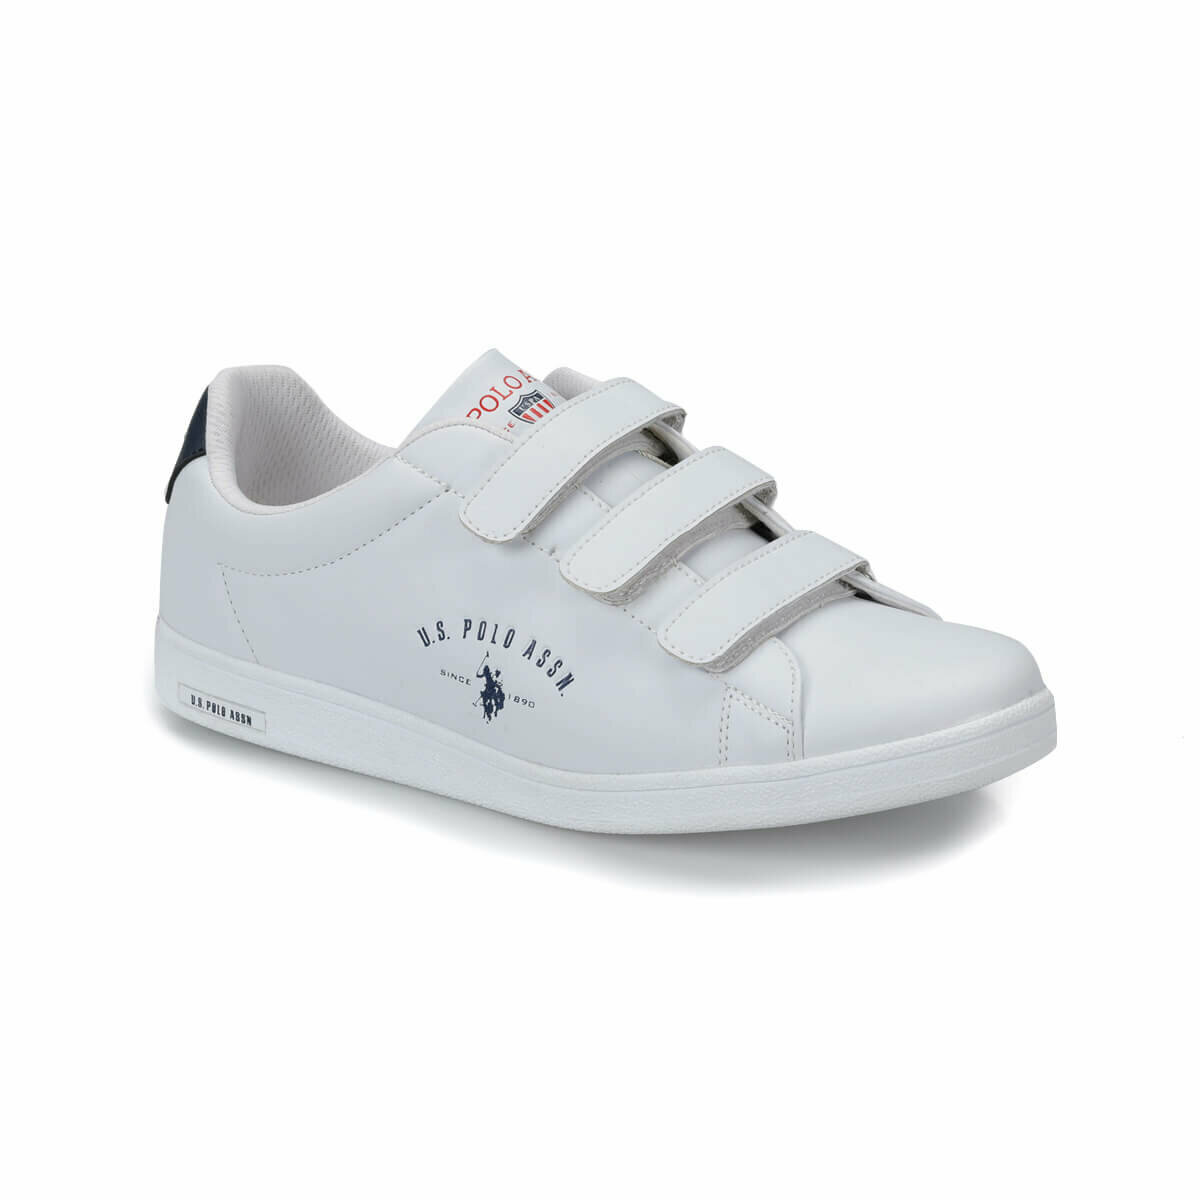 FLO White Men's Sneaker Shoes Hook & Loop Fashion Casual Man Shoes U.S. POLO ASSN. SINGER